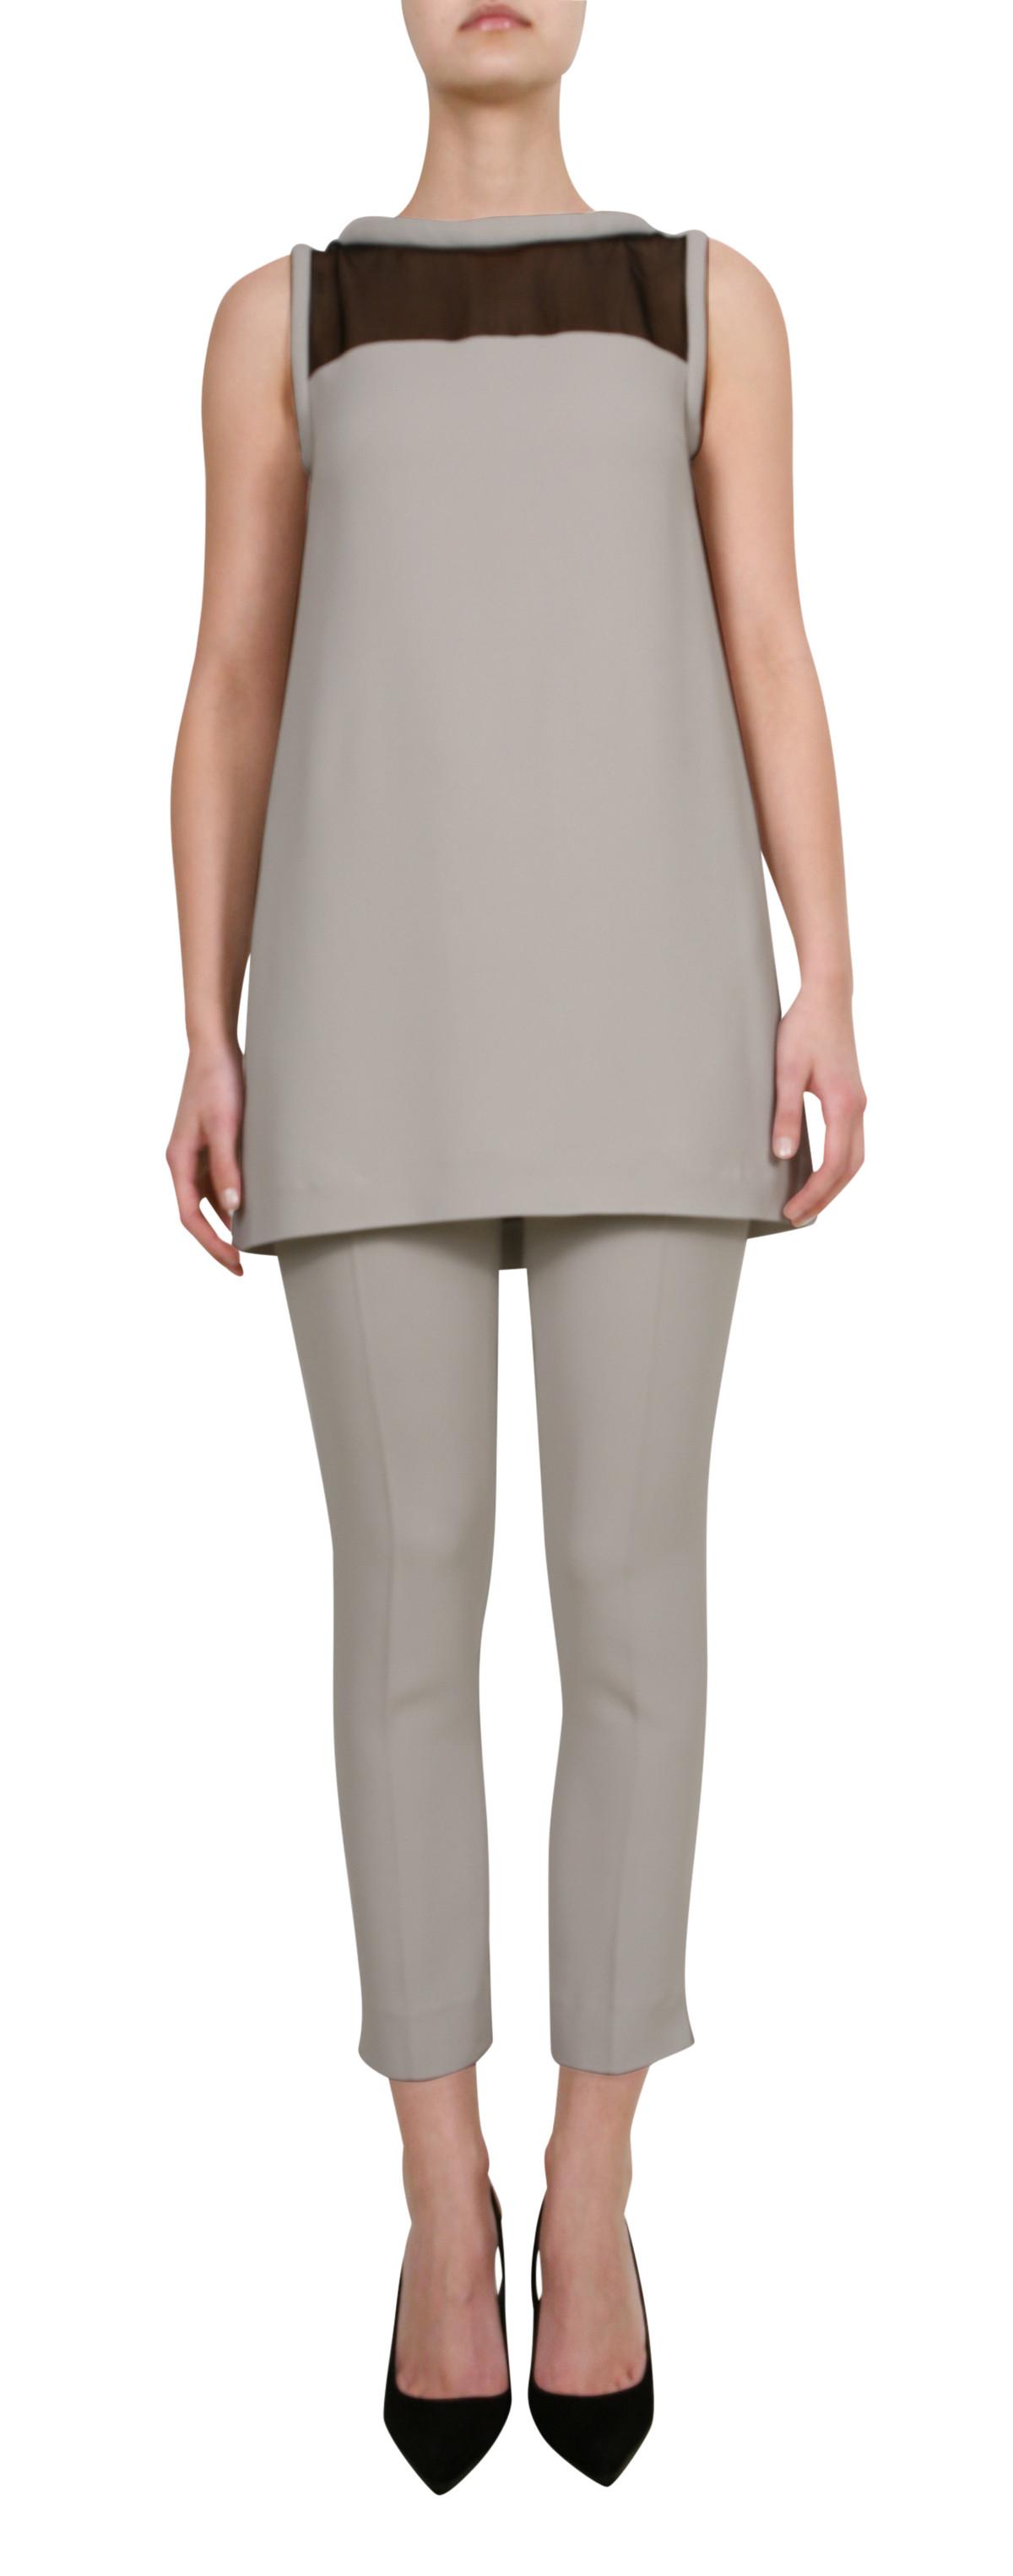 FUTURE FASHION long tunic - Dresses & Skirts - Onlineshop | SCHUMACHER - Onlineshop